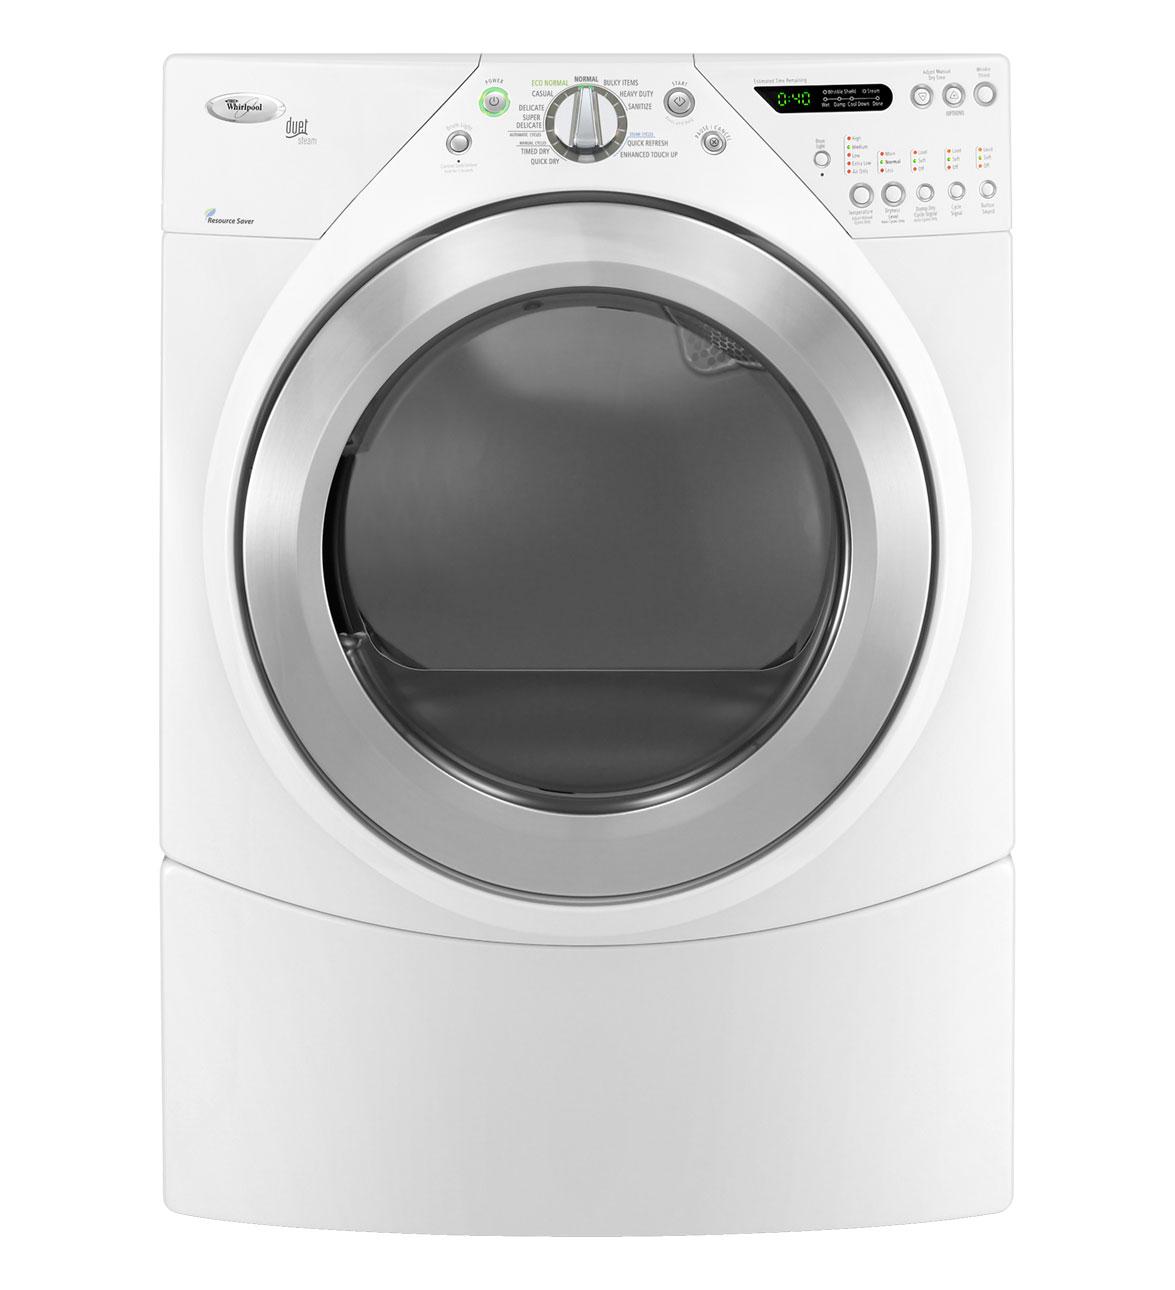 Wgd9550ww whirlpool wgd9550ww duet gas dryers white - Whirlpool duet washer and dryer ...